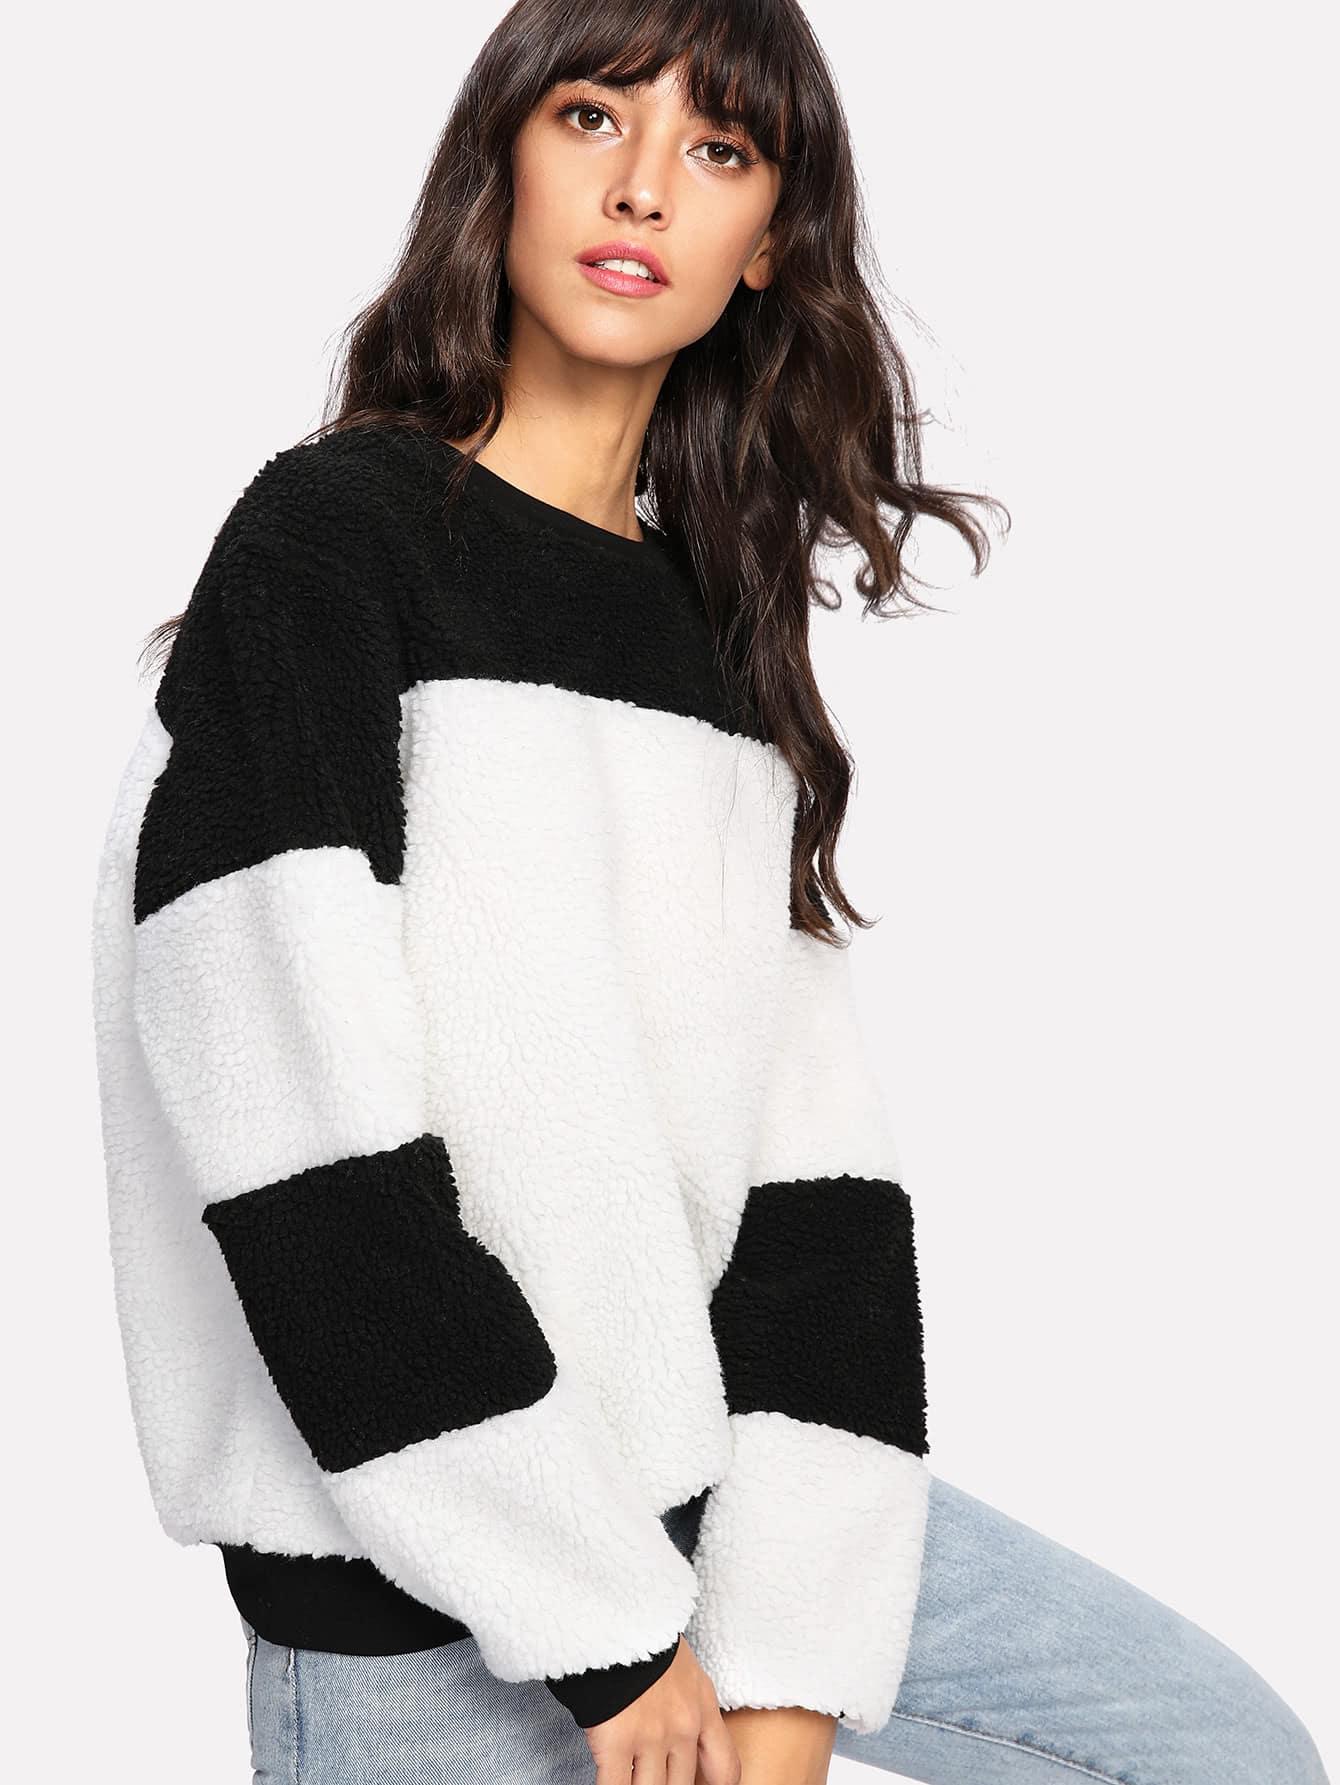 Two Tone Cut And Sew Sweatshirt